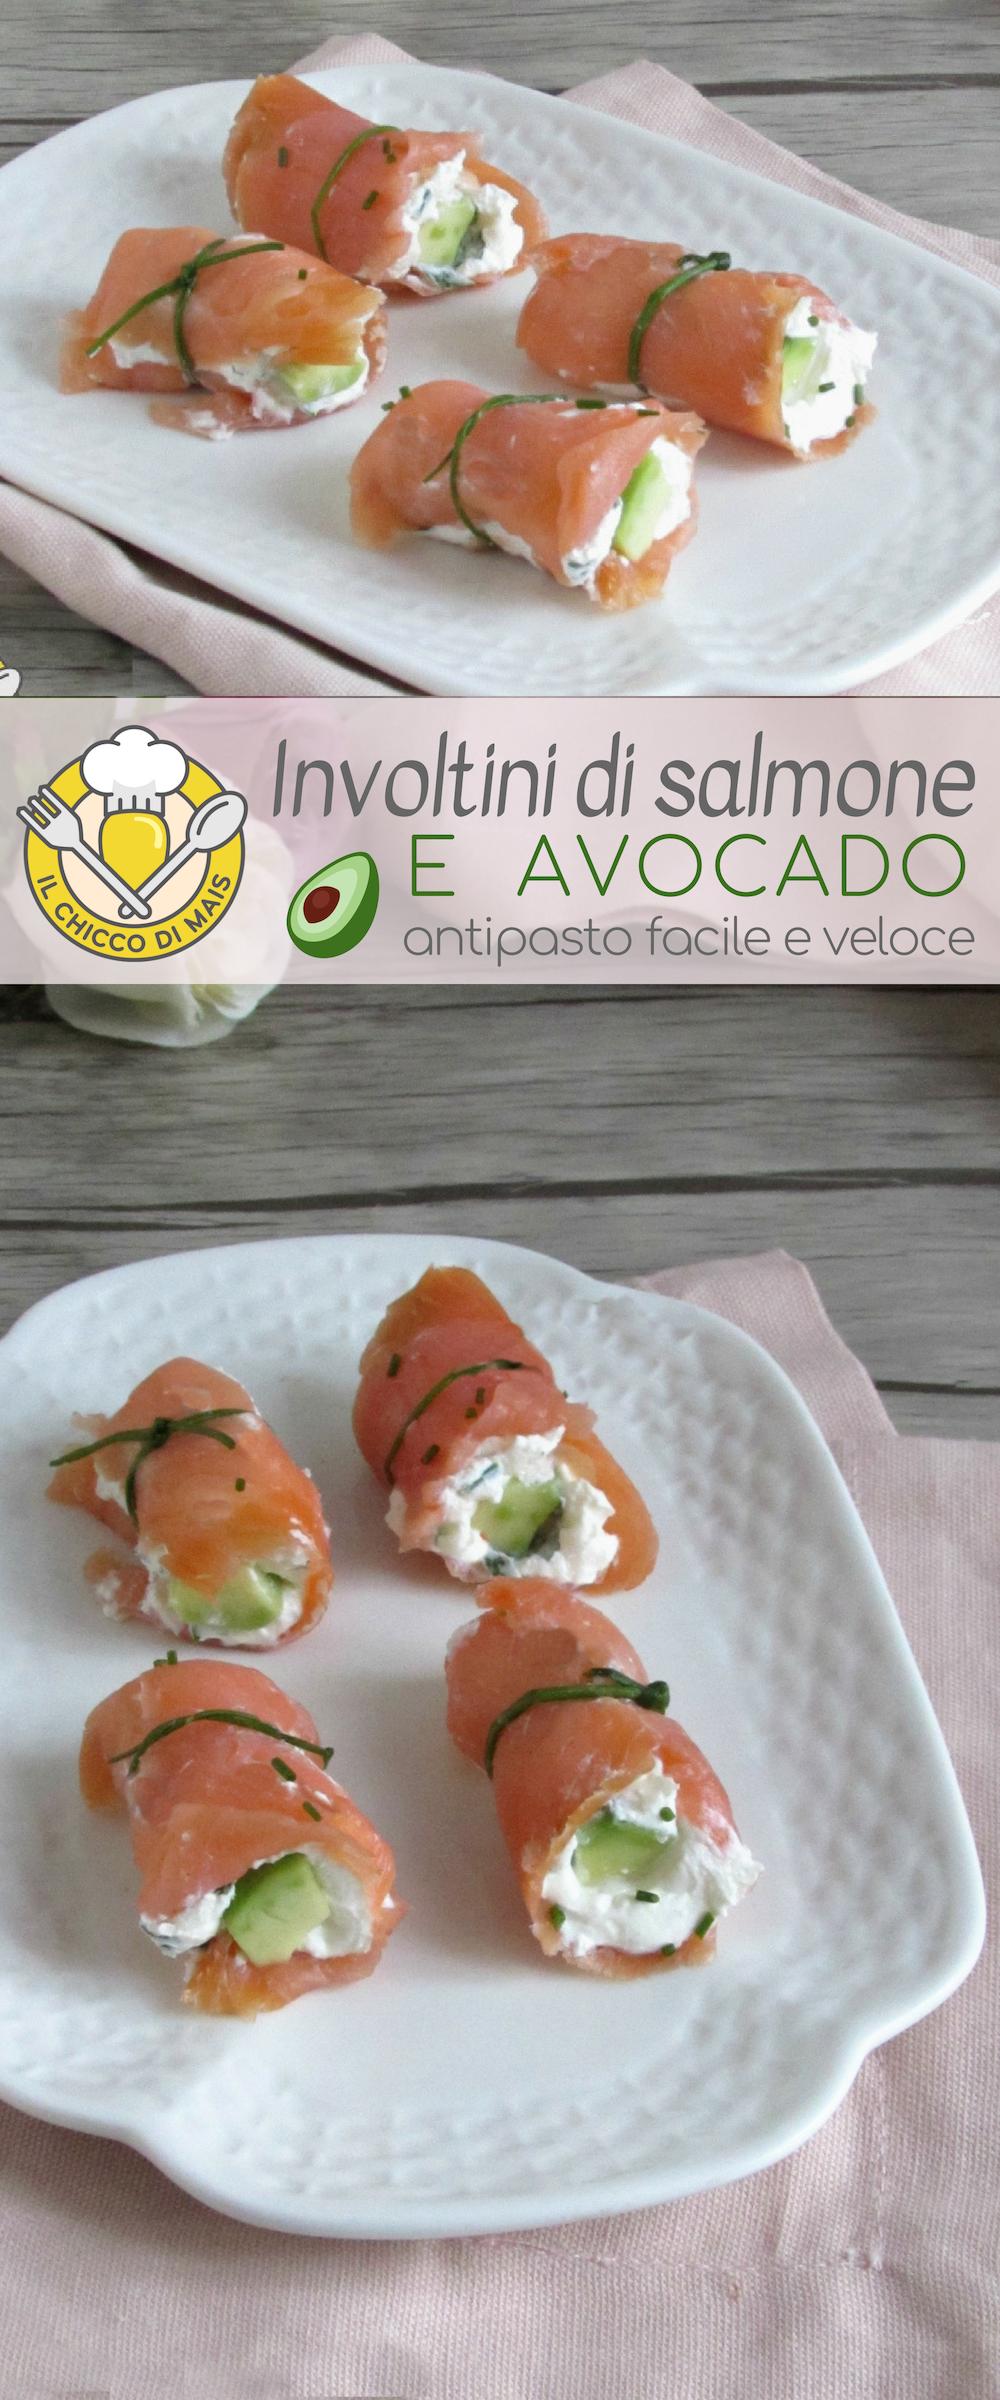 Salmon and avocado rolls